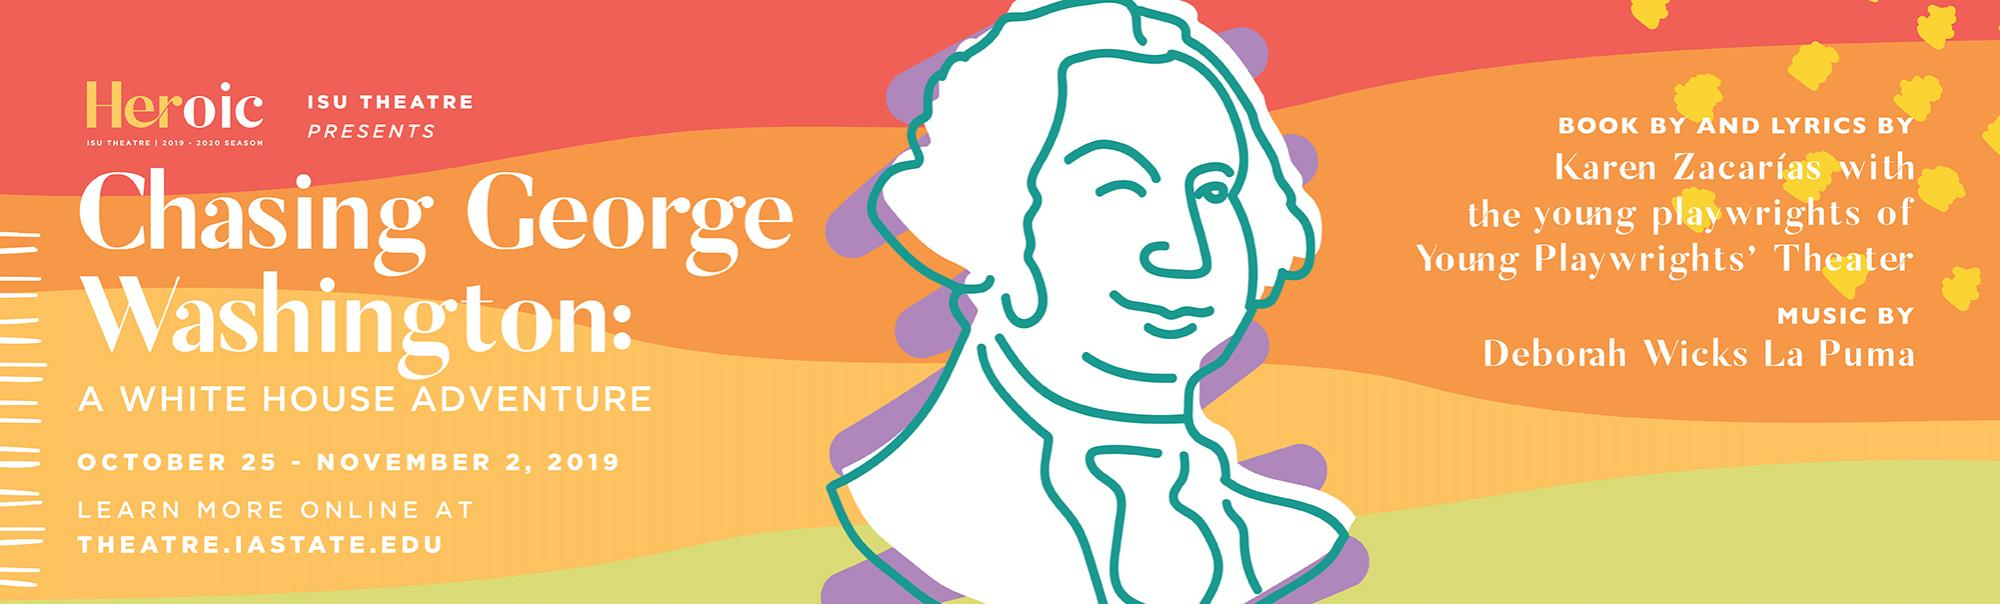 ISU Theatre's Chasing George Washington